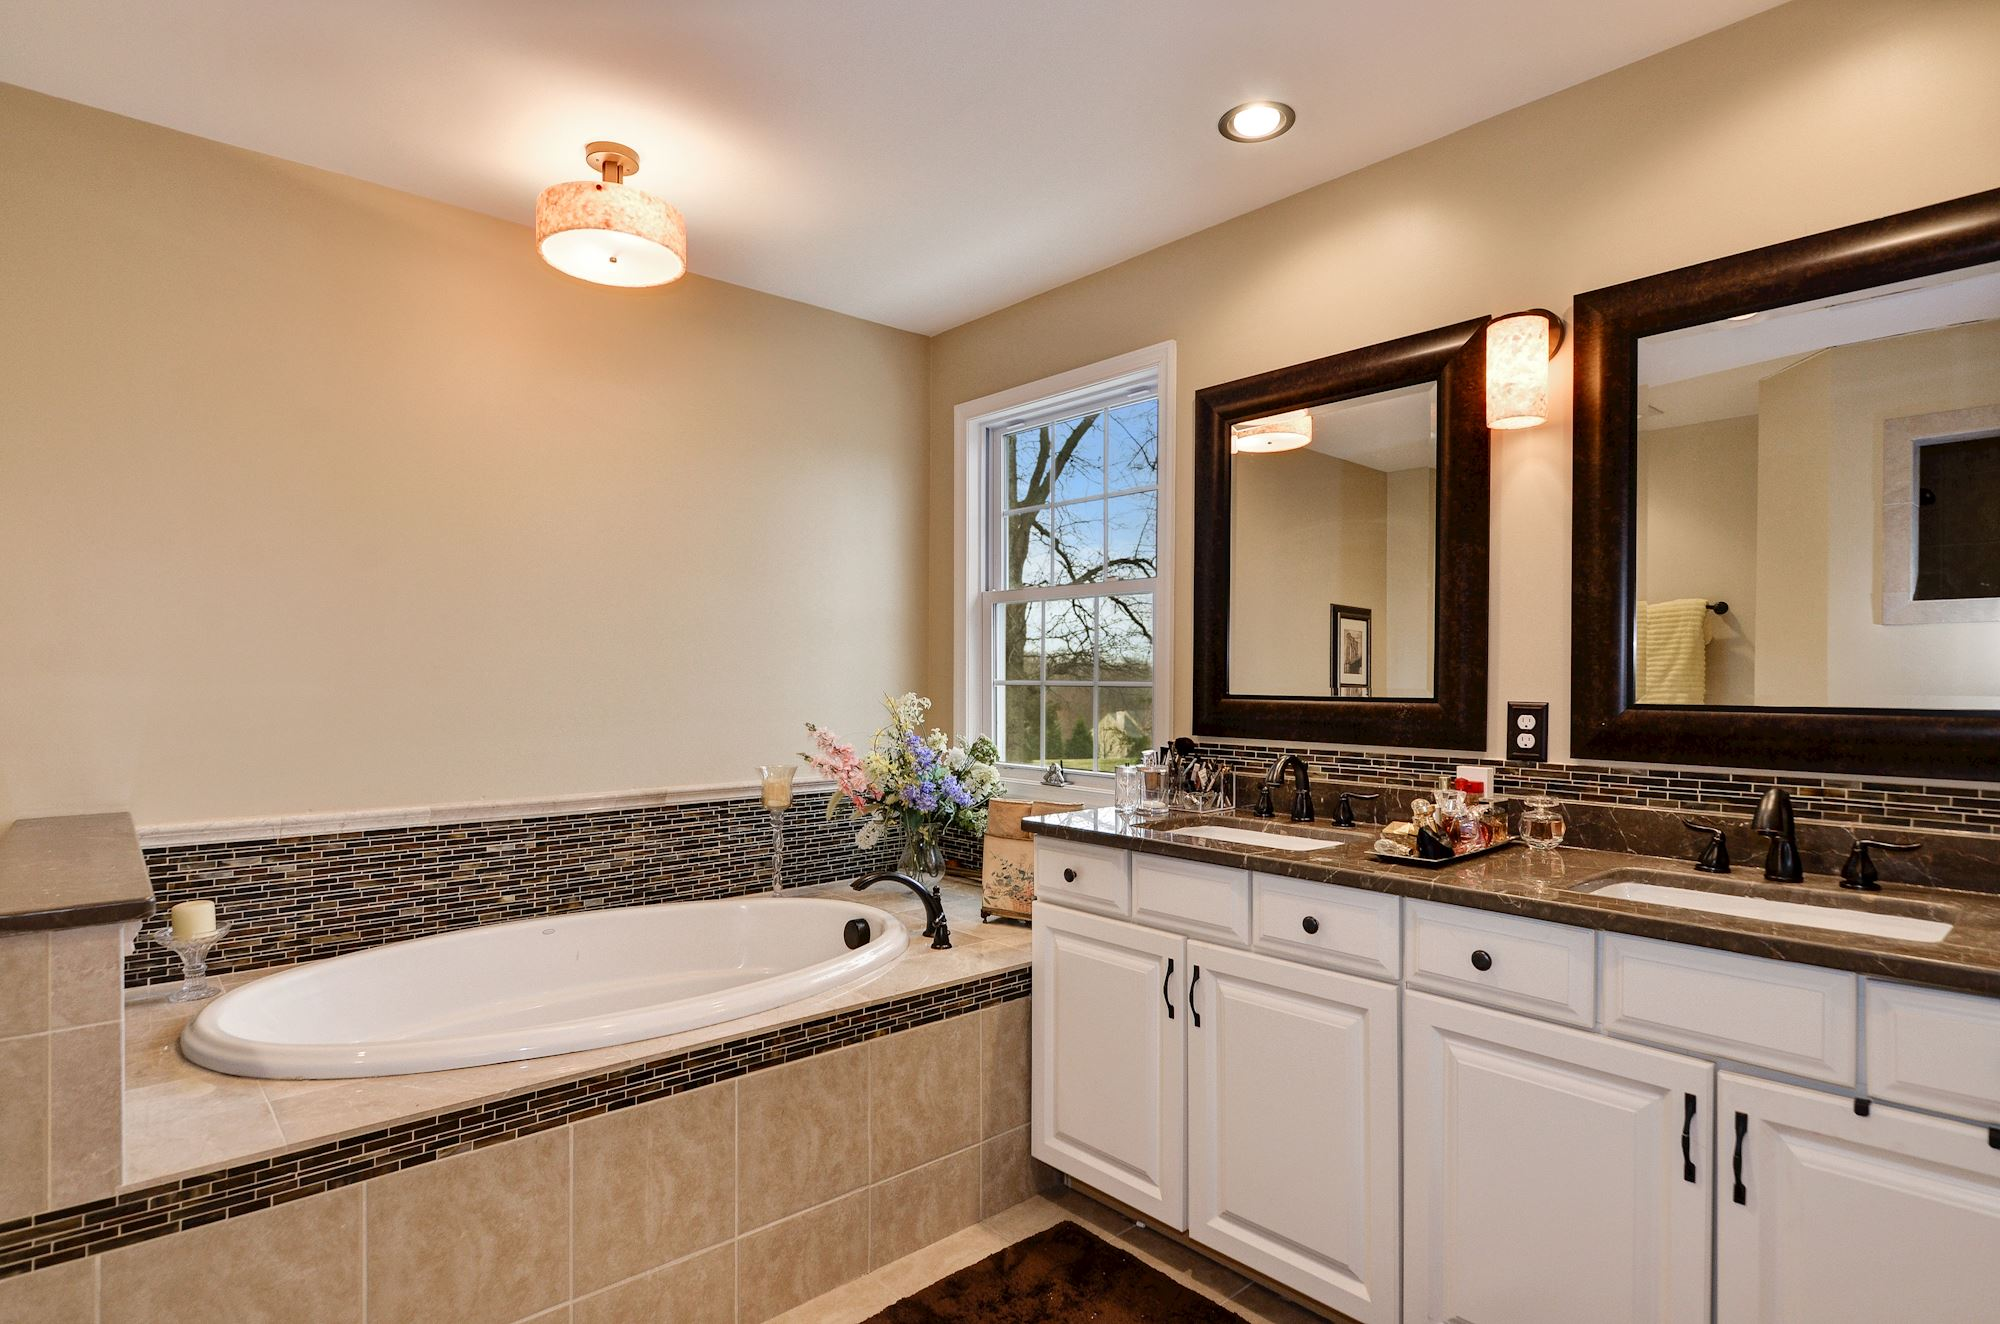 Colvin Kitchen Bath